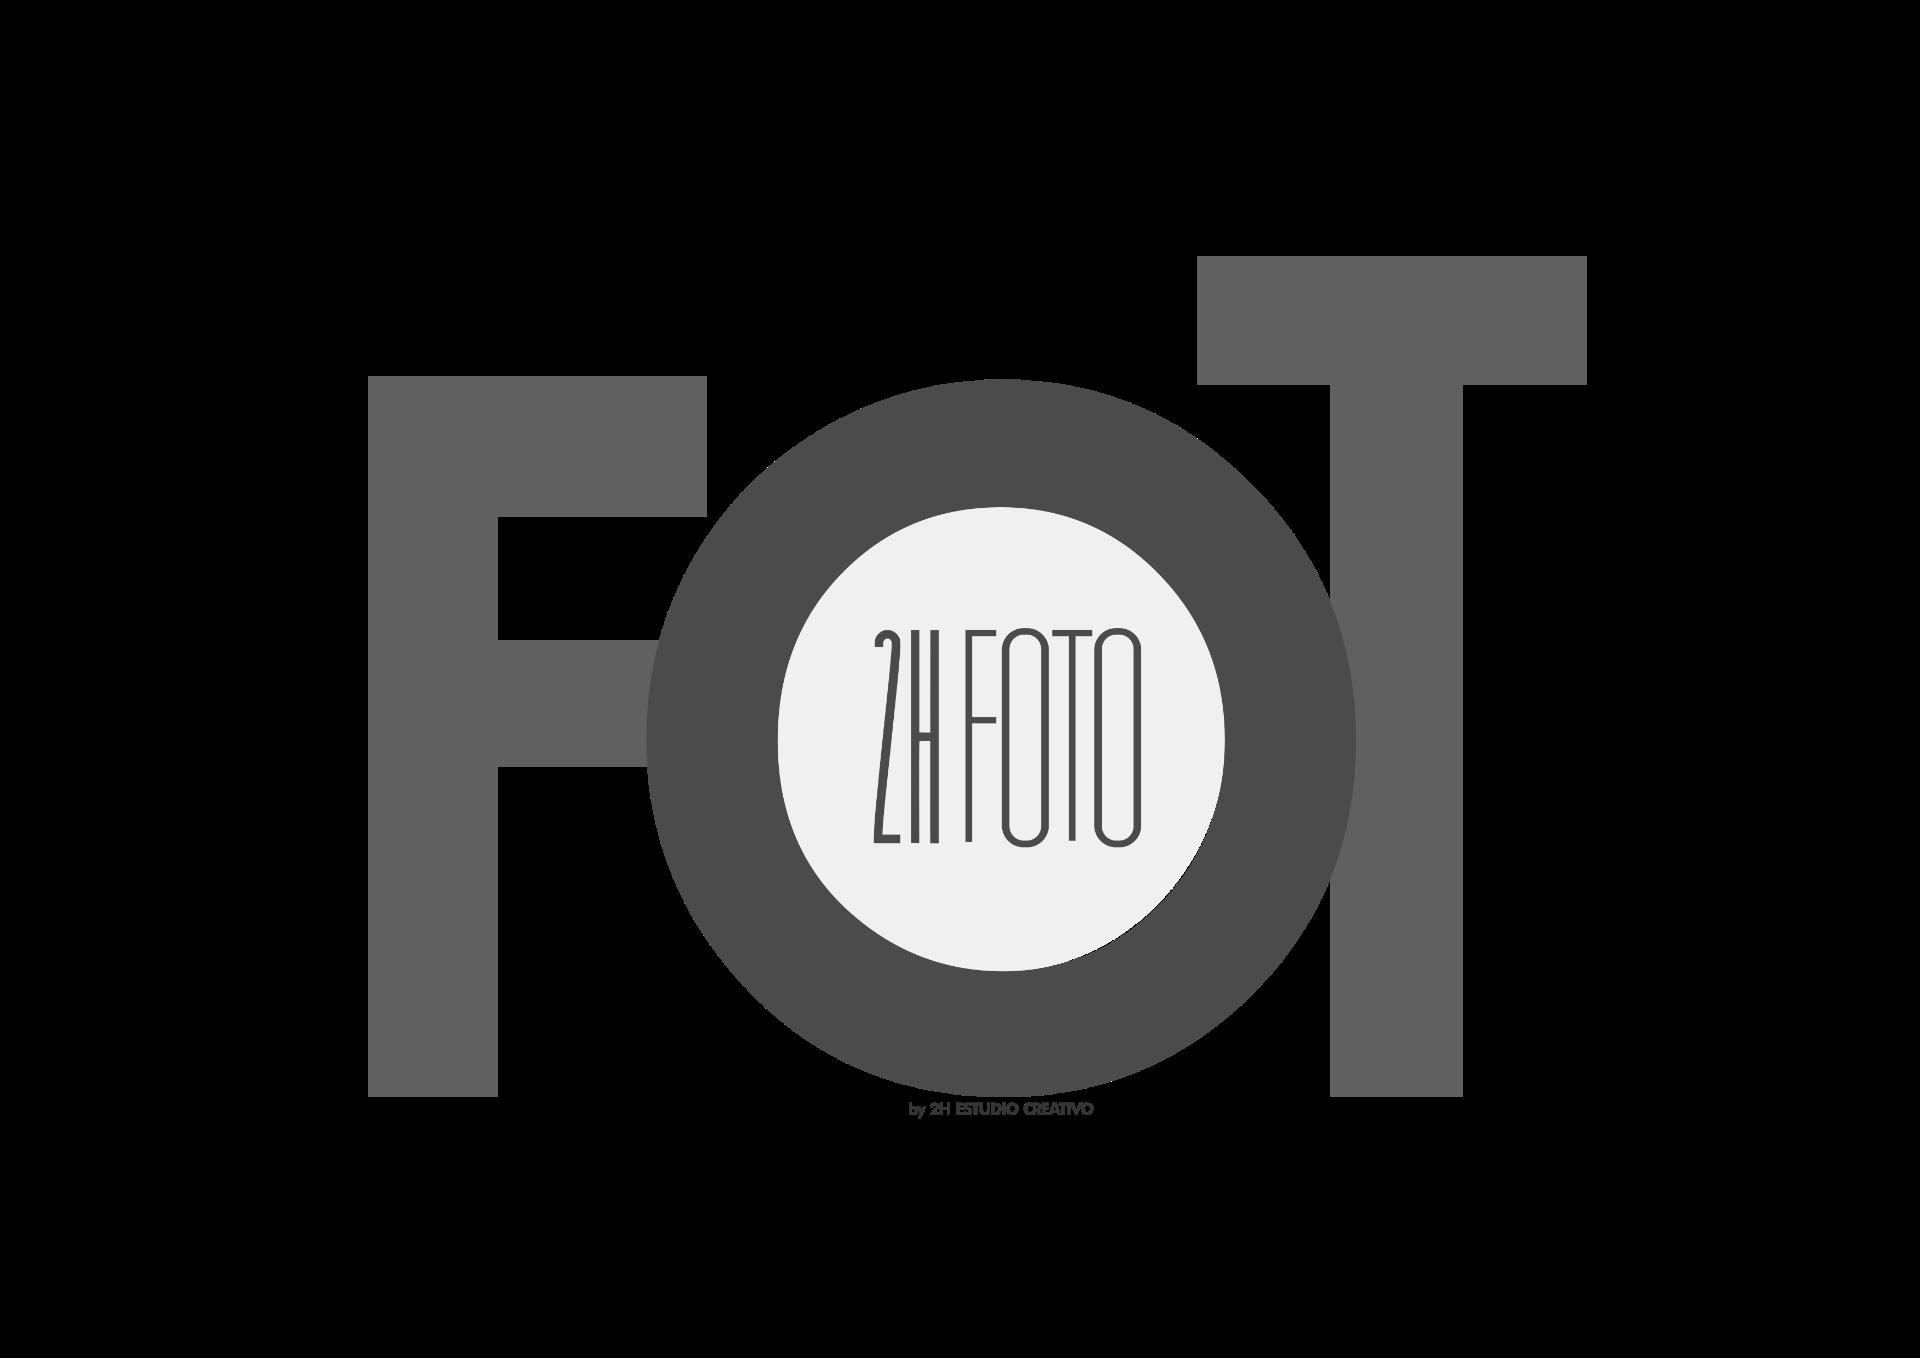 logo 2h foto_edited.png